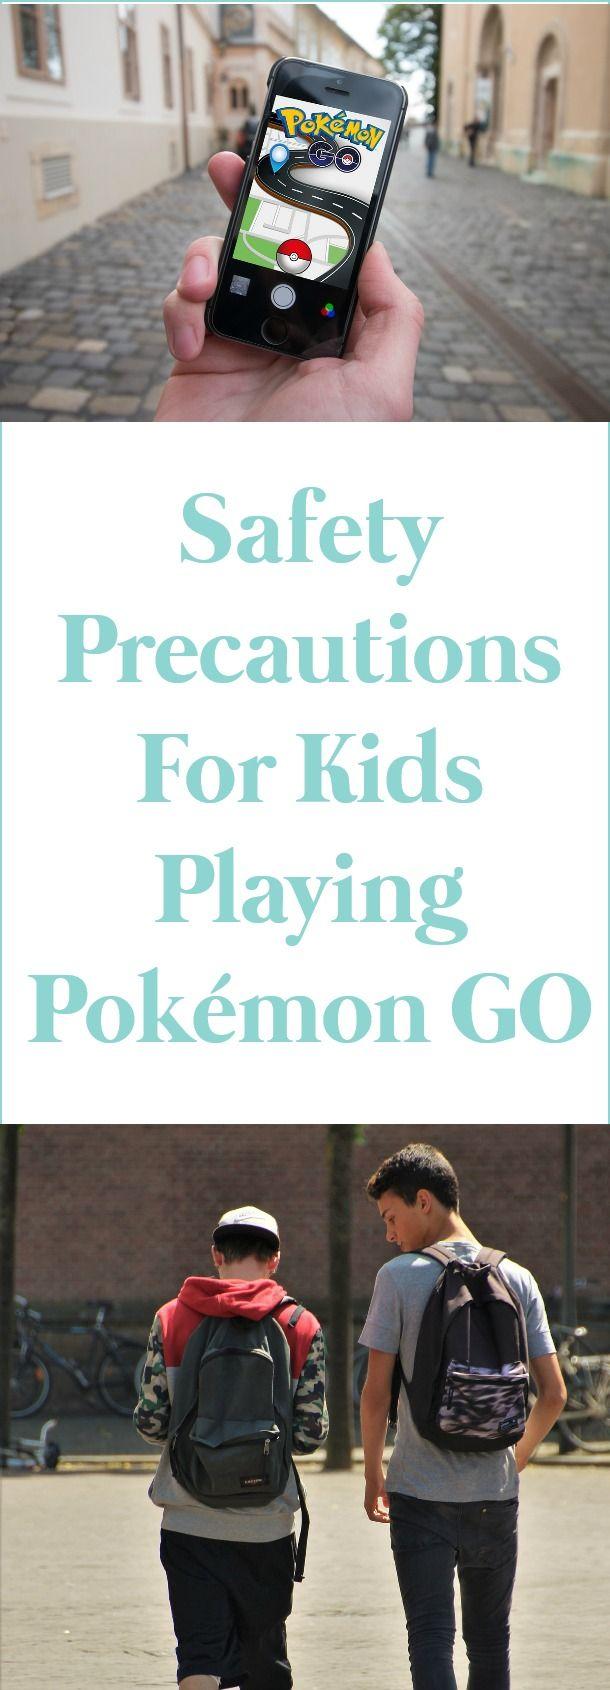 Safety Precautions For Kids Playing Pokémon GO Kids